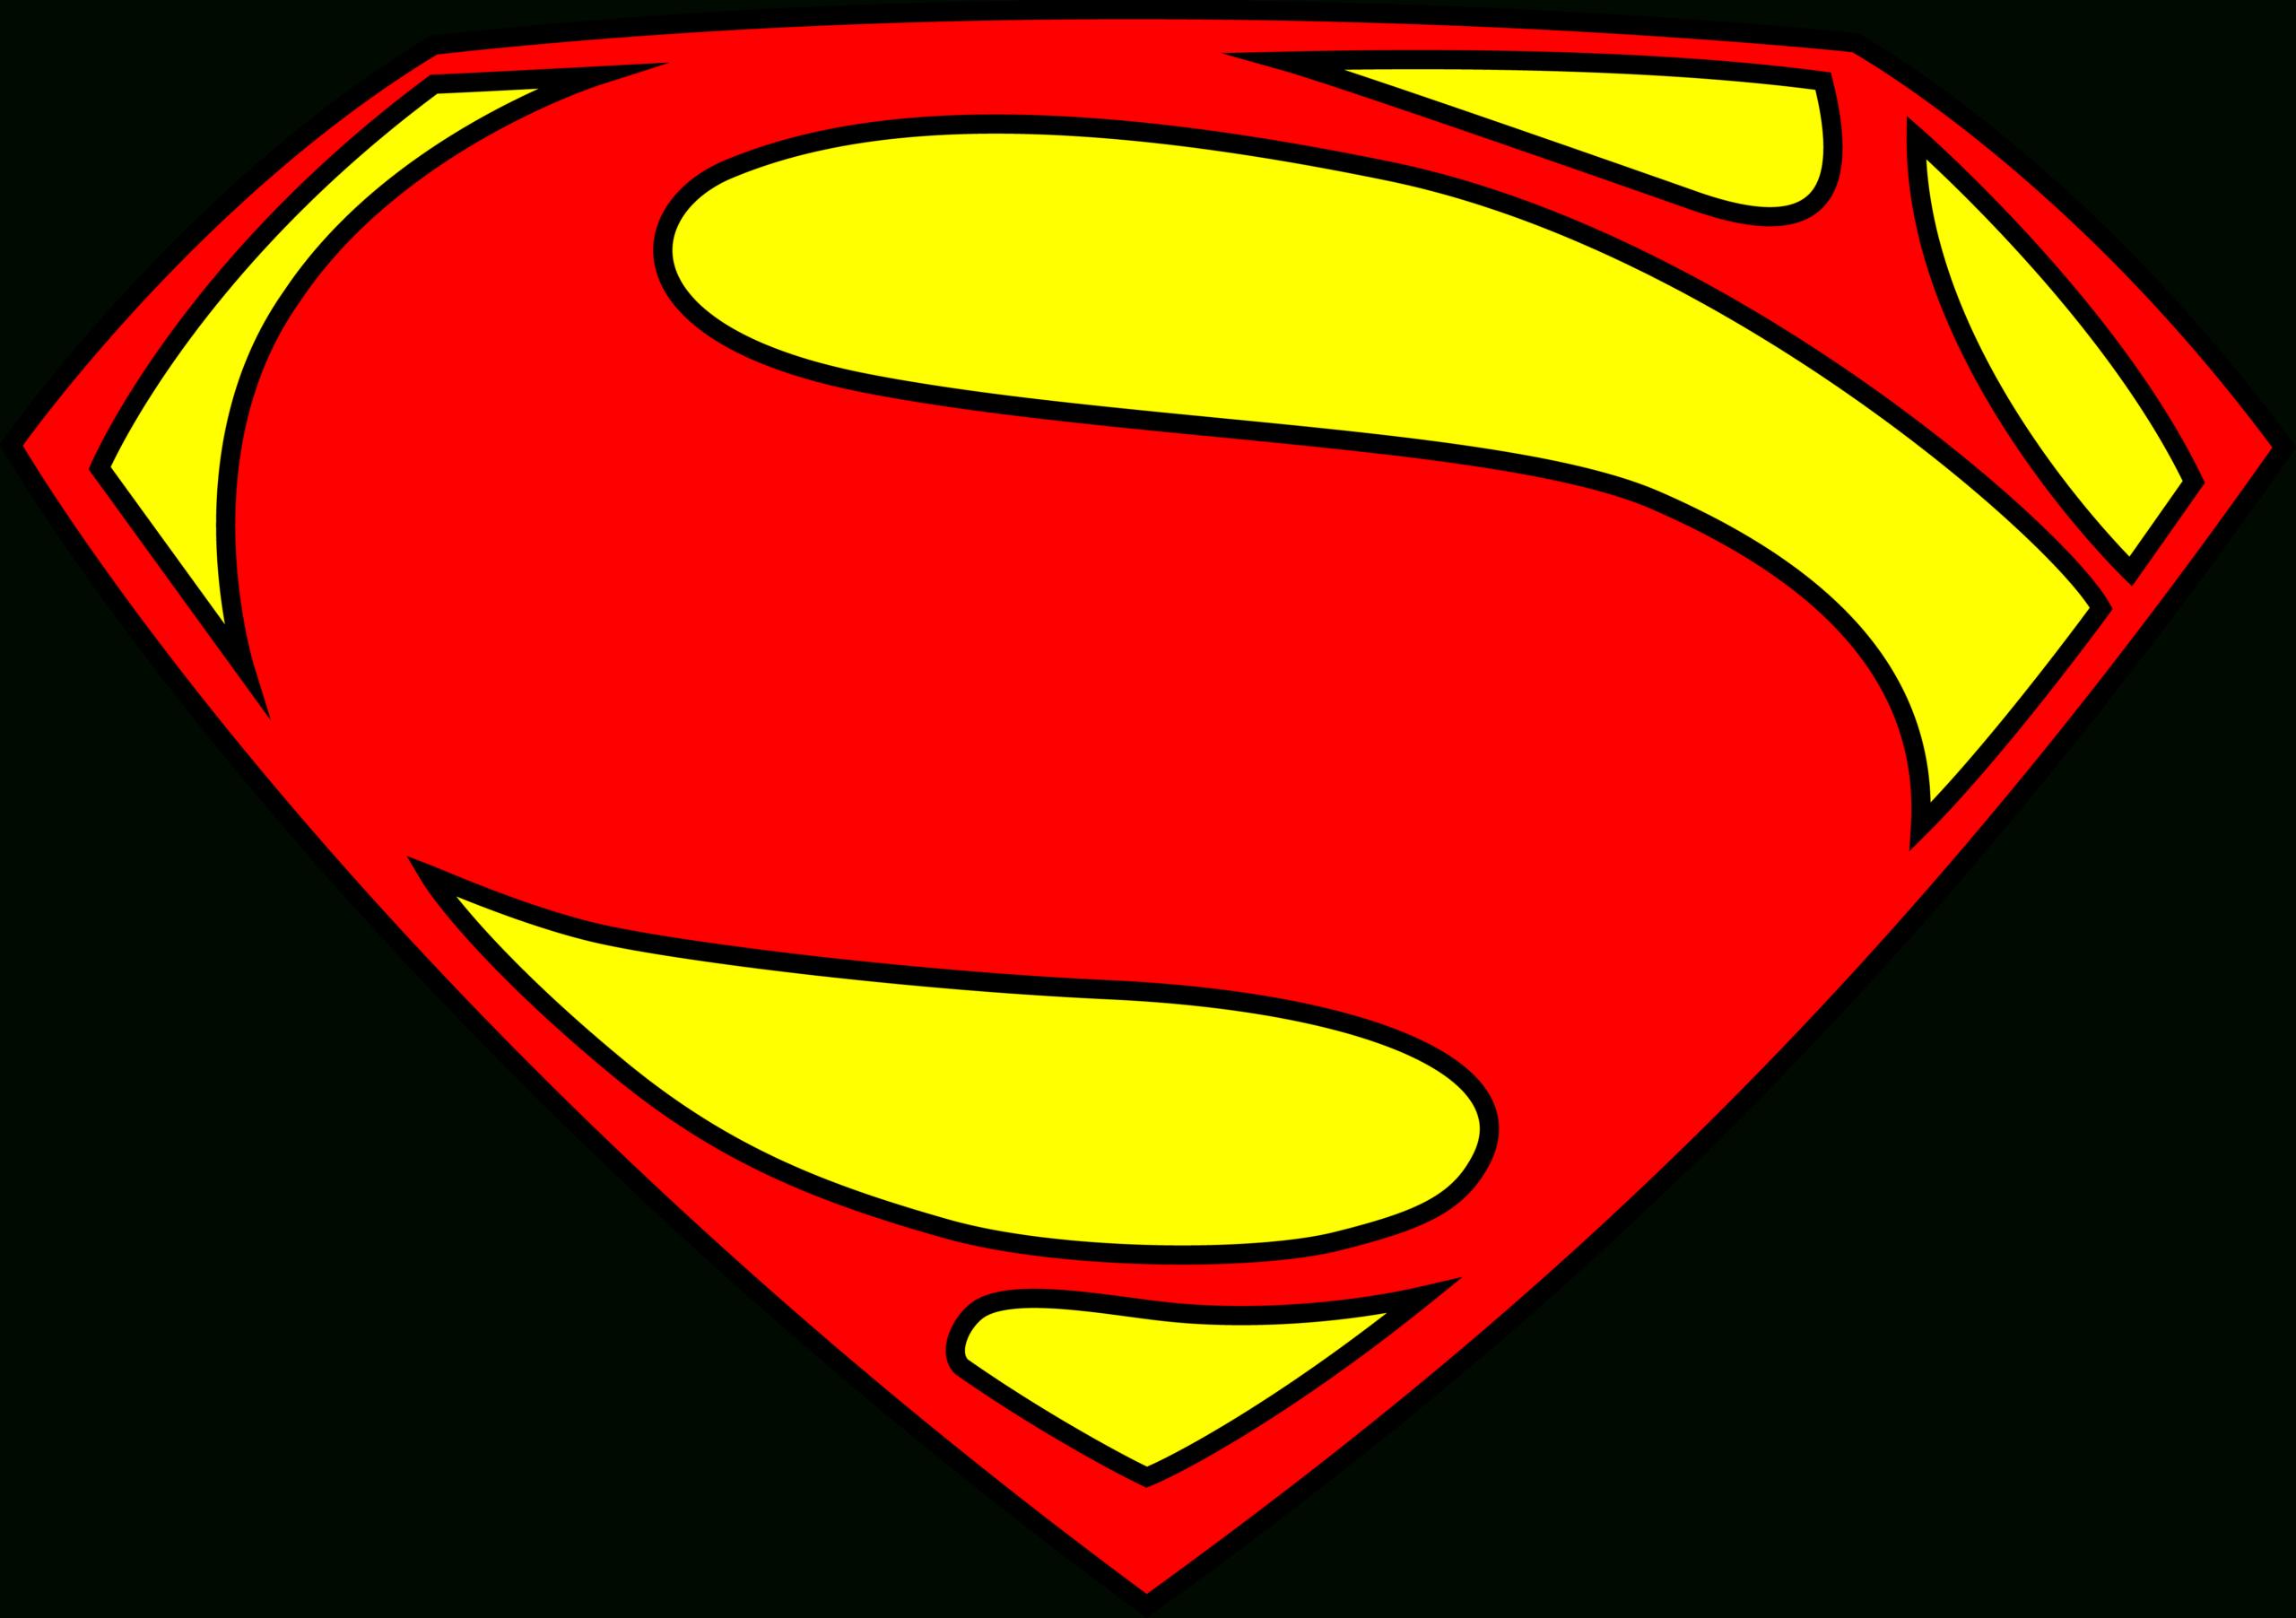 Blank Superman Logo Transparent & Png Clipart Free Download Inside Blank Superman Logo Template